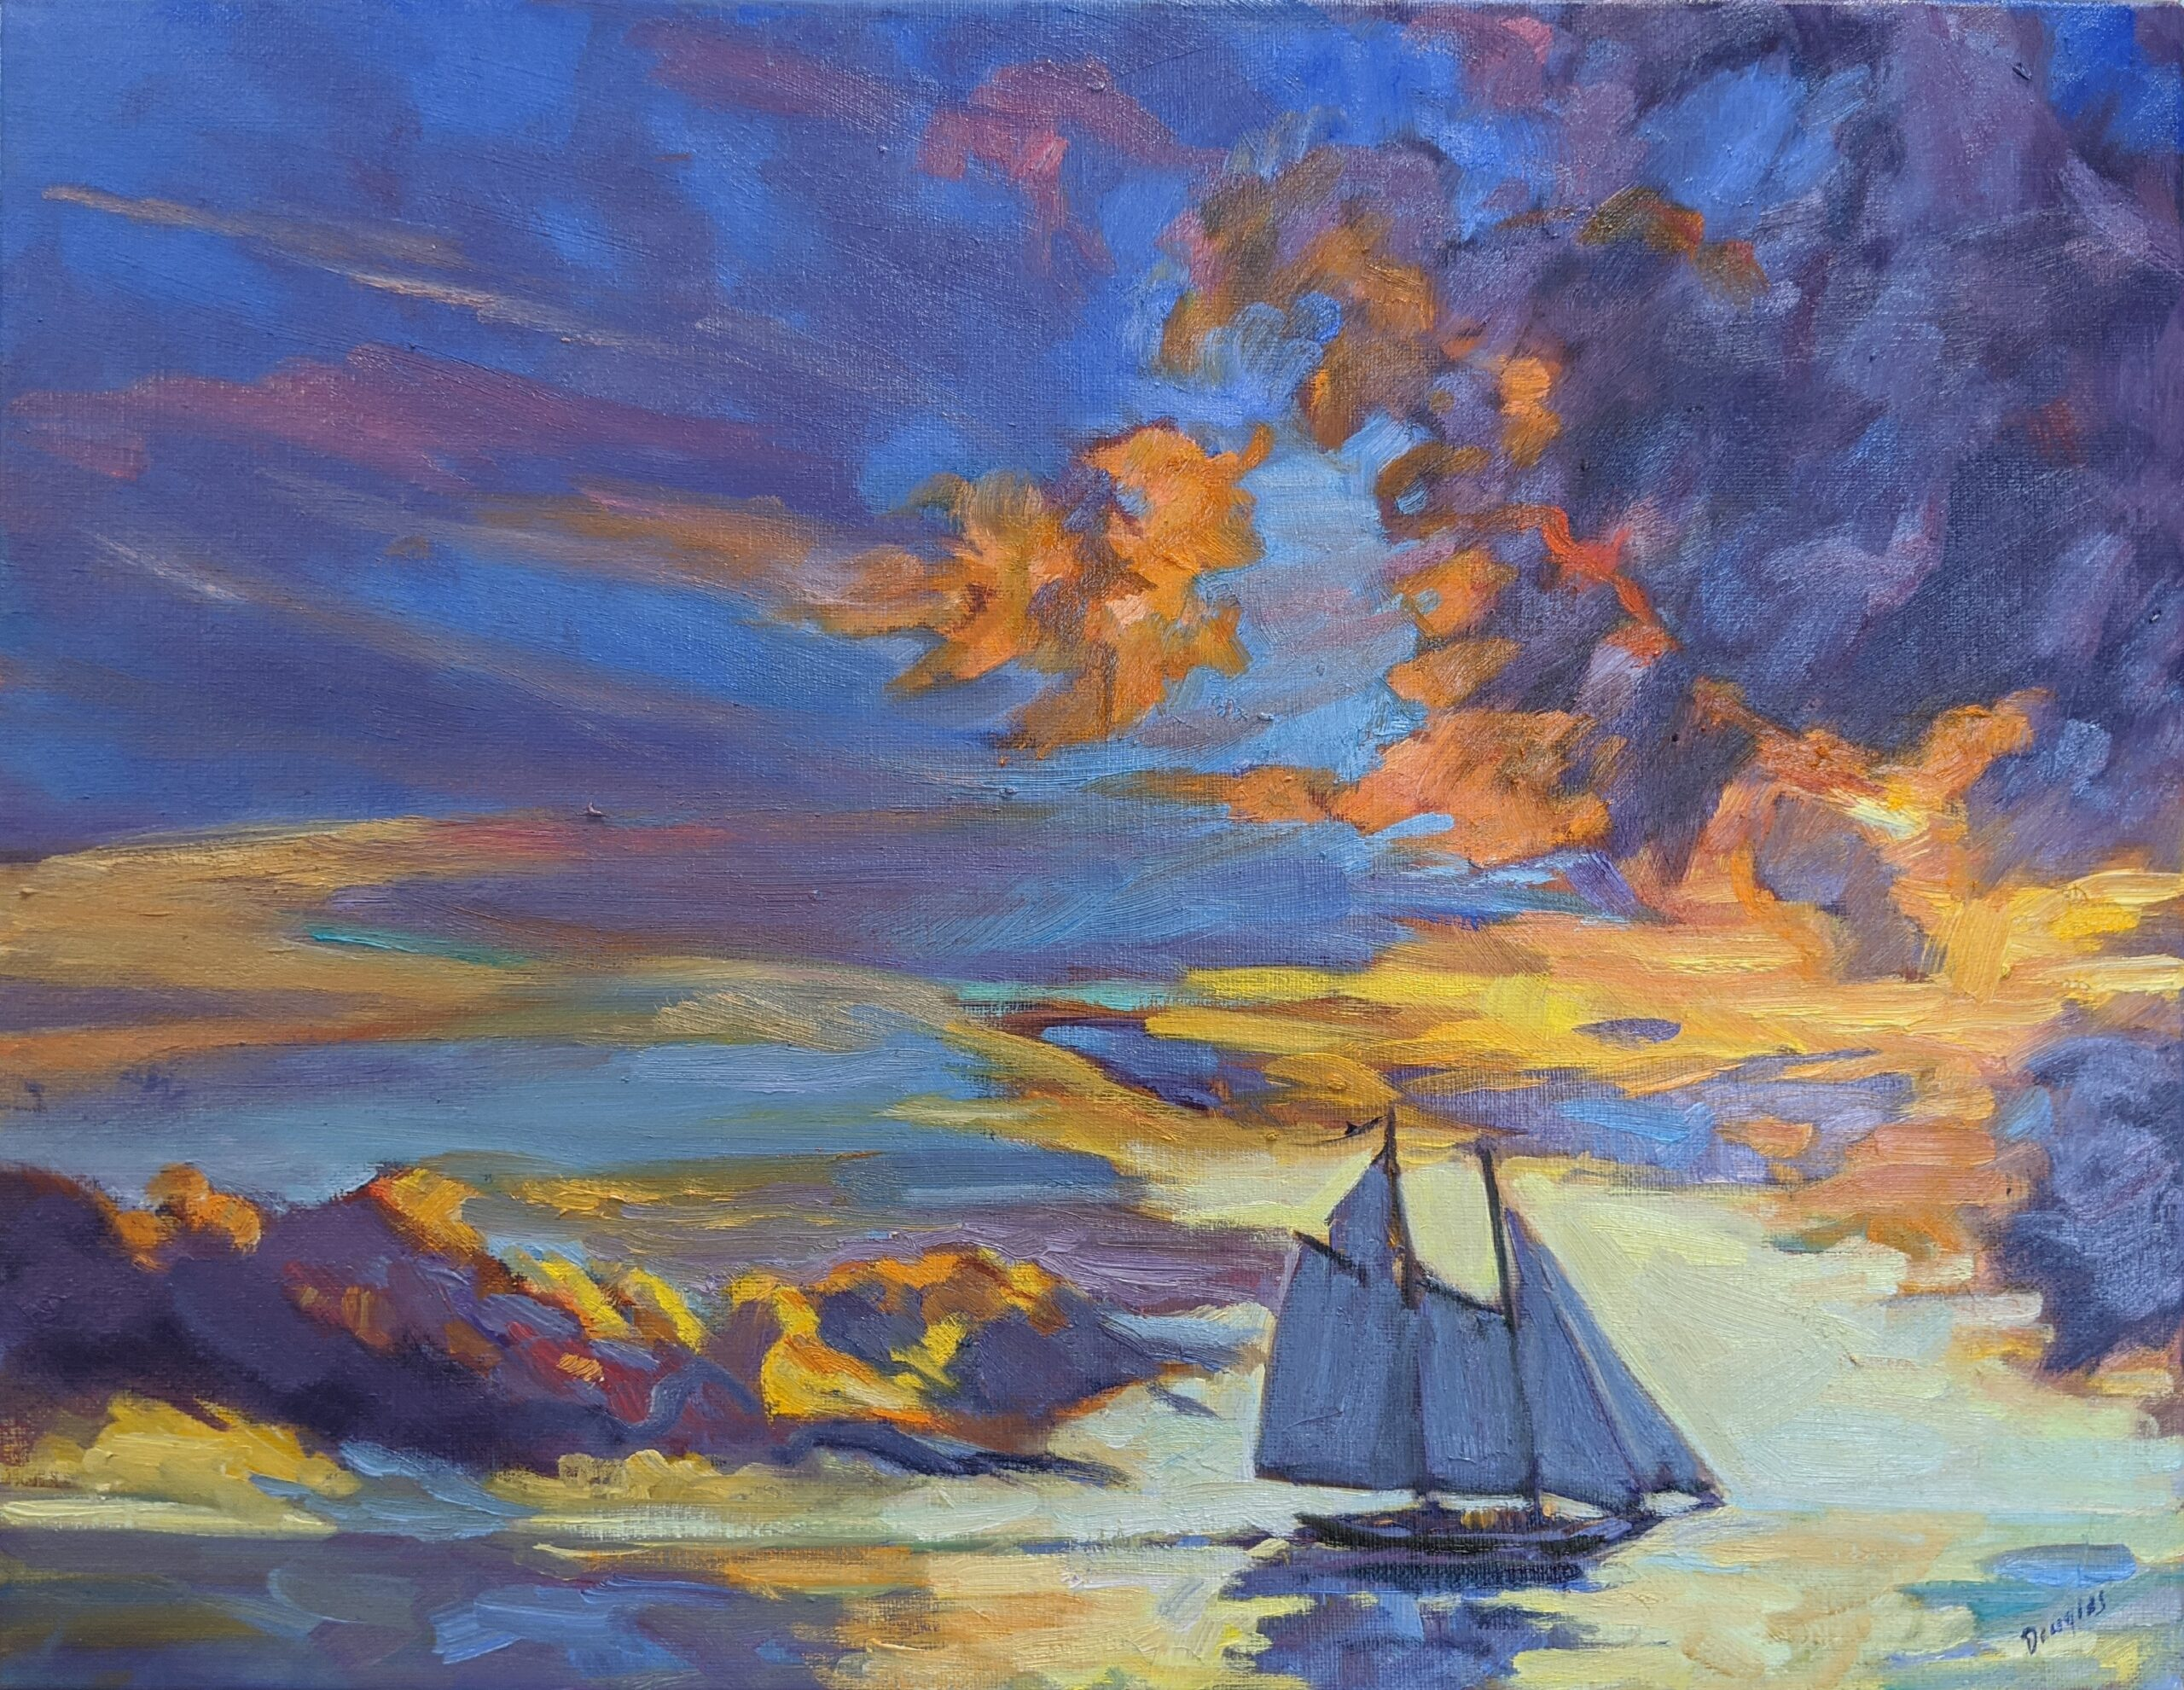 Sunset Sail, available through Folly Cove Fine Art, Rockport, MA